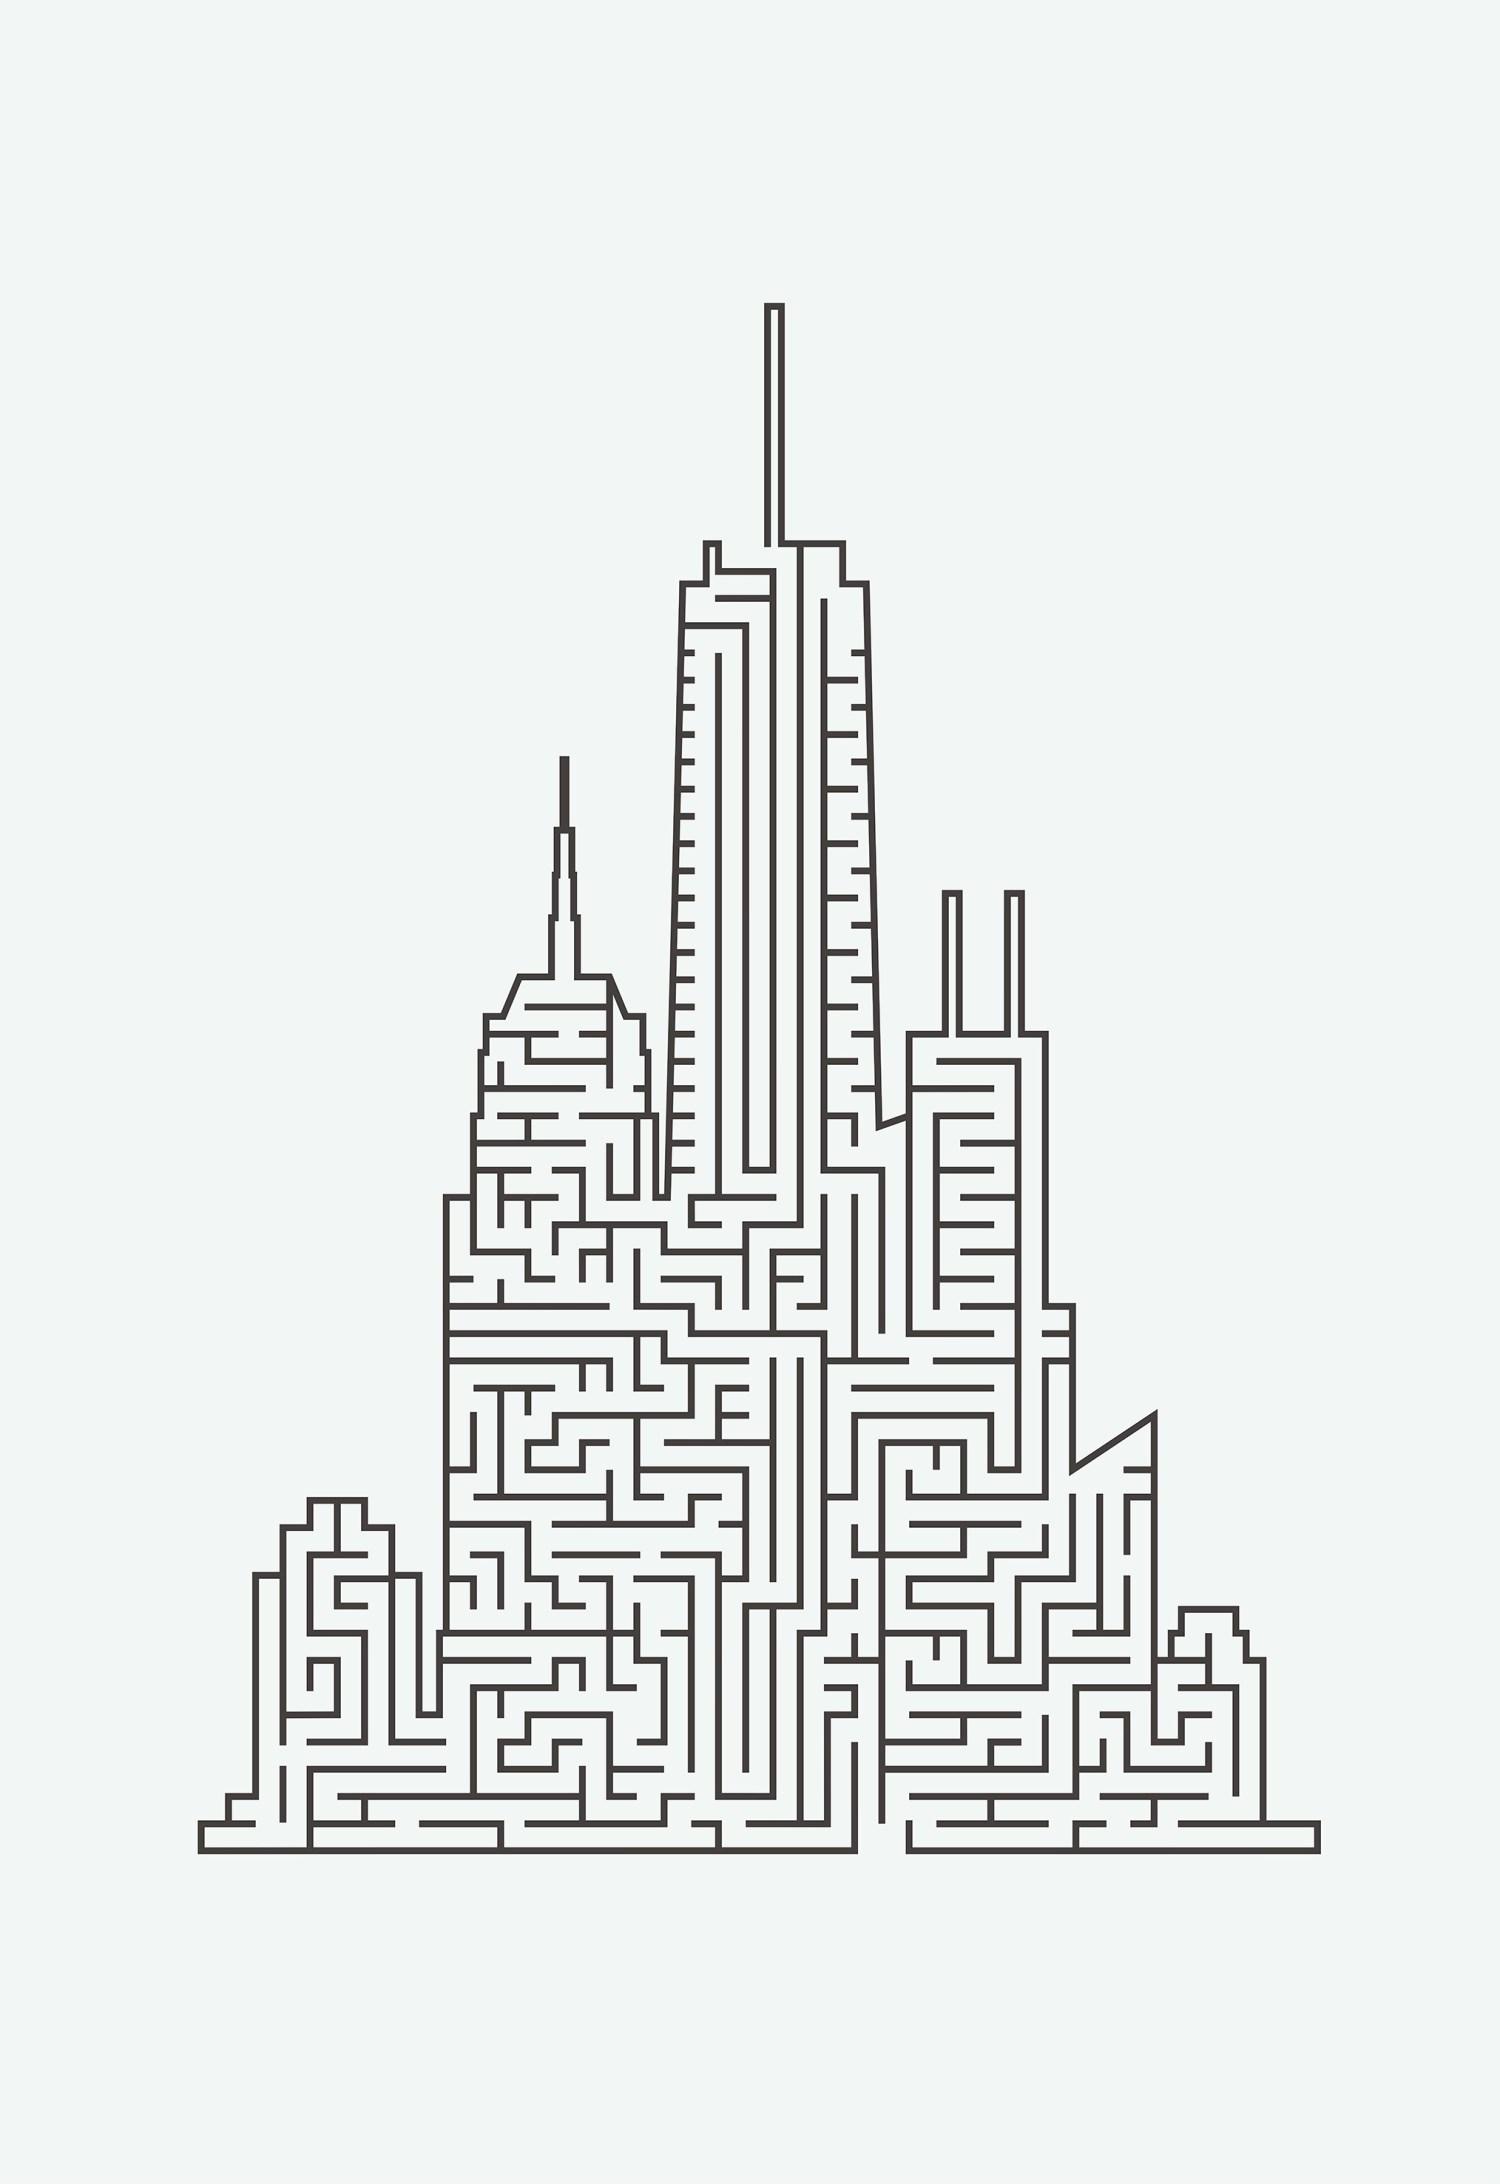 ROLLERBLADE - Poster Design / Diseño de Cartel